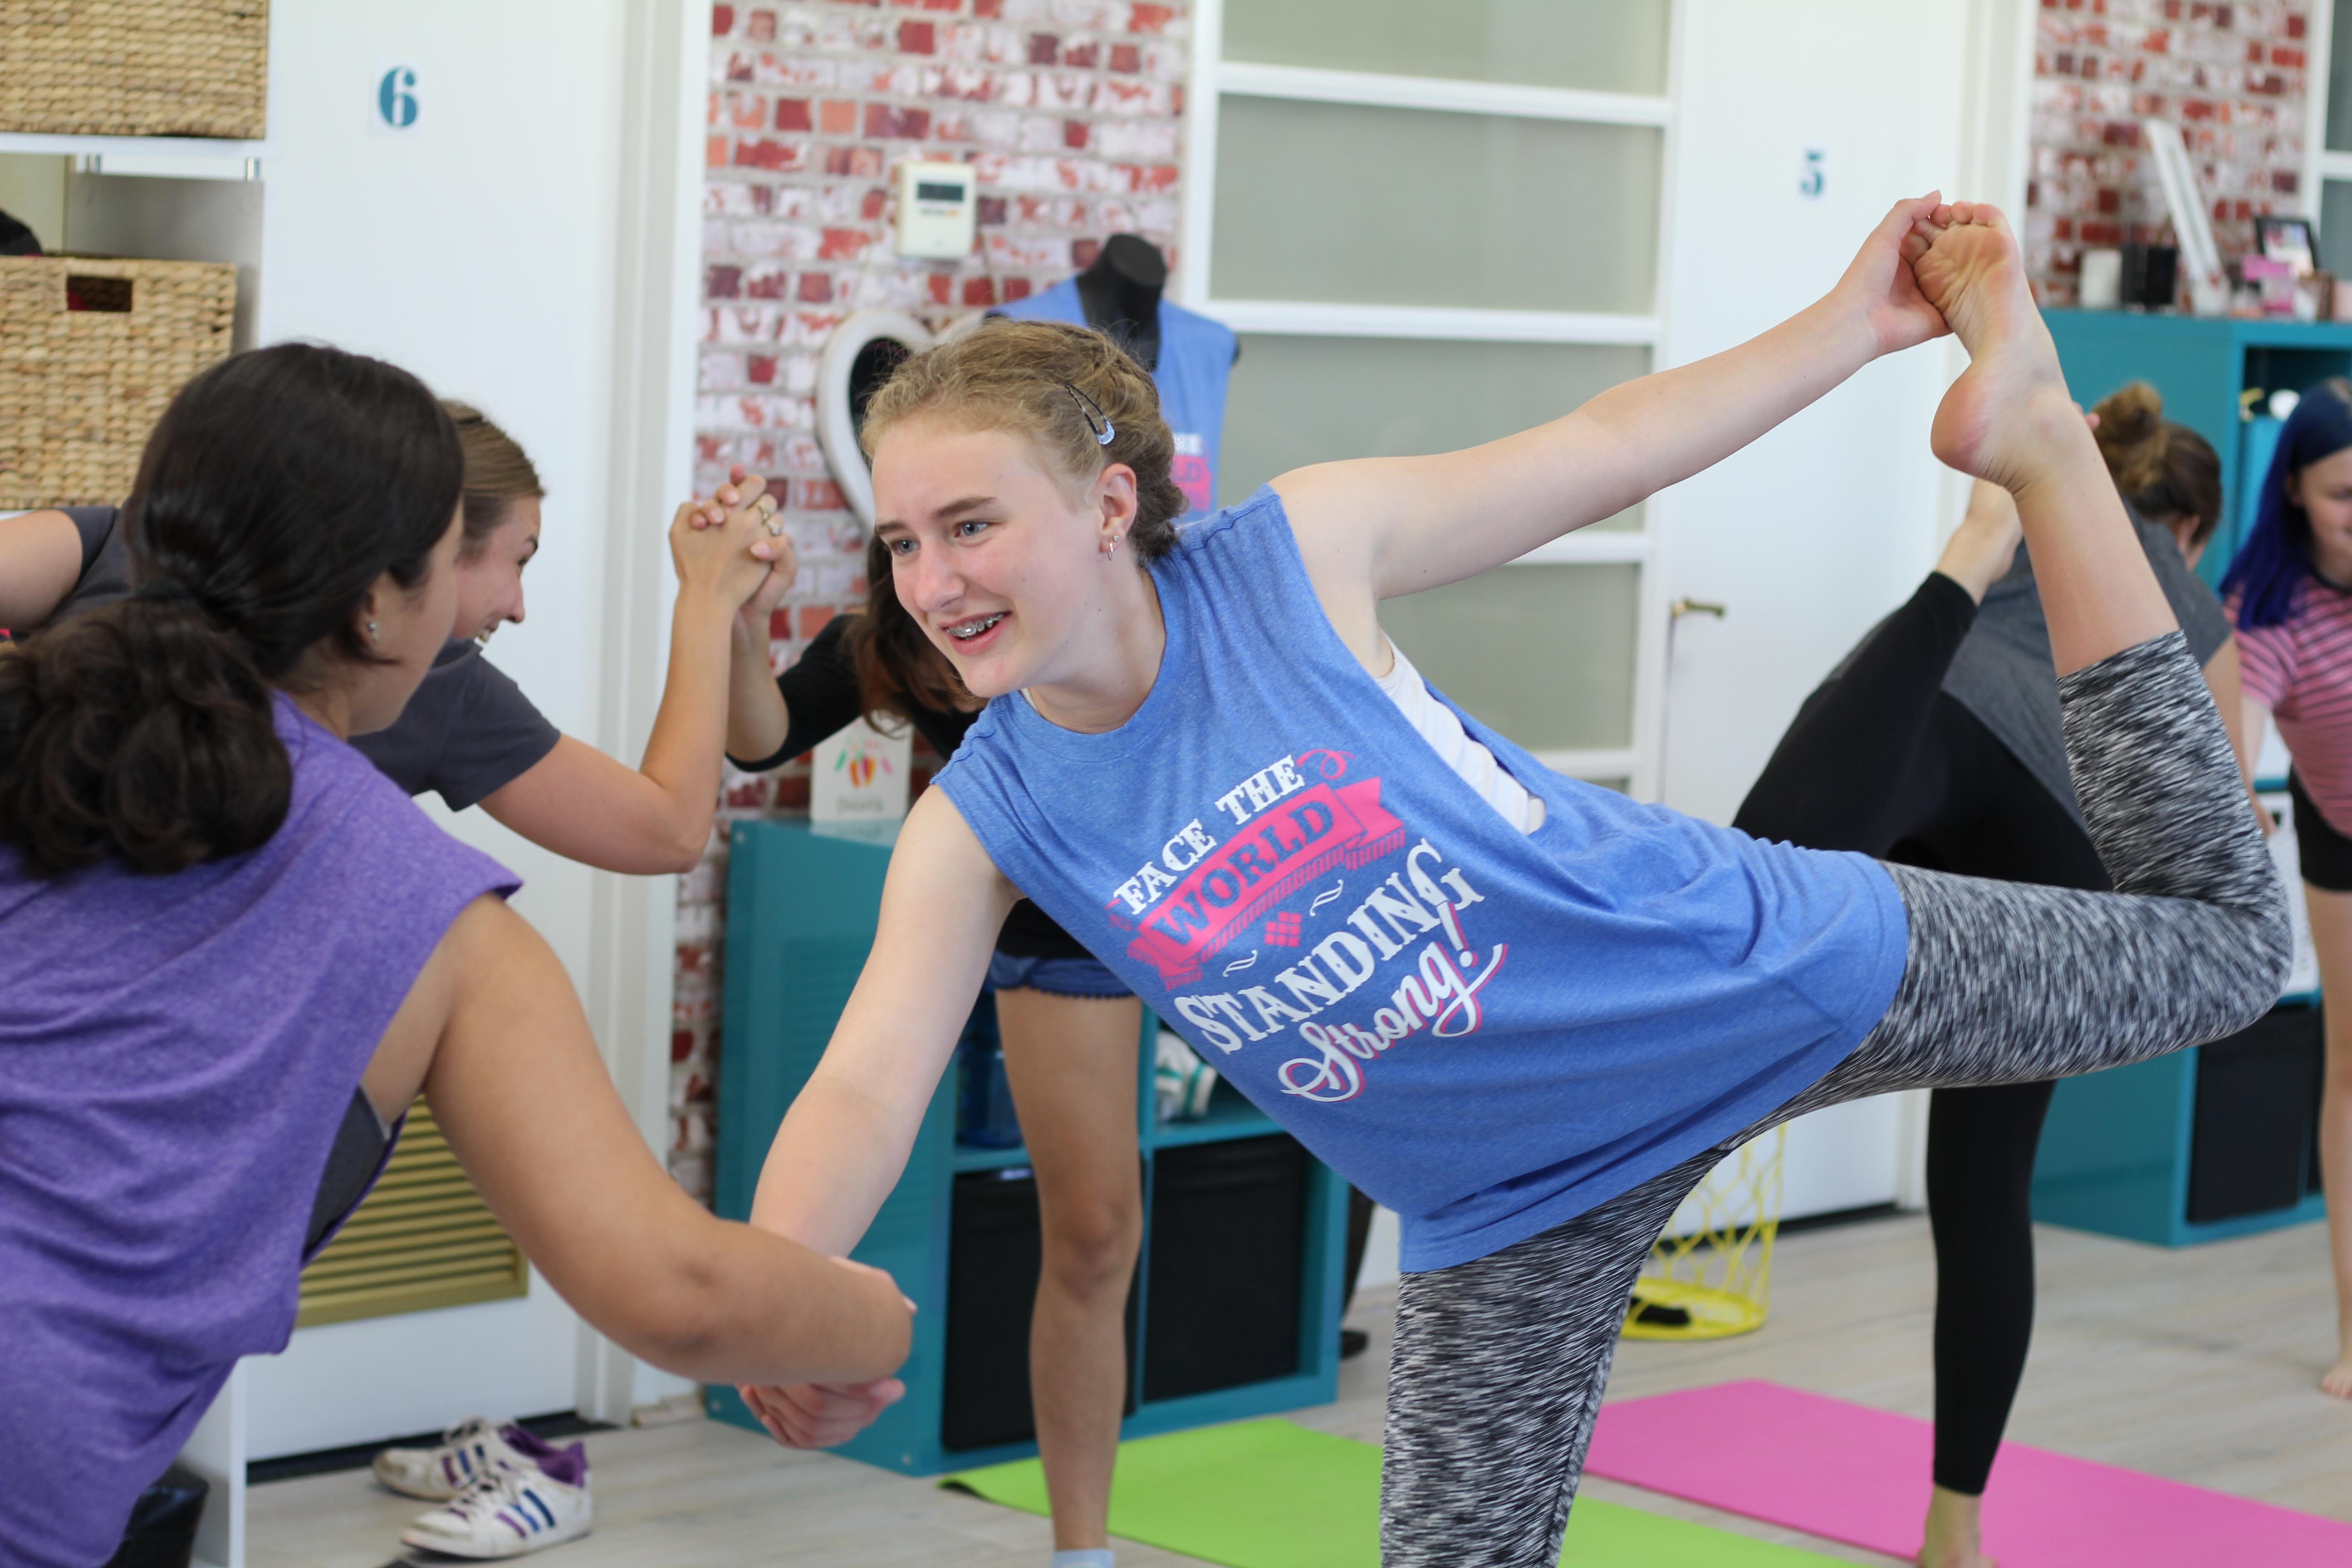 Girls 11-16yrs Confidence, Self Esteem & Resilience Workshop